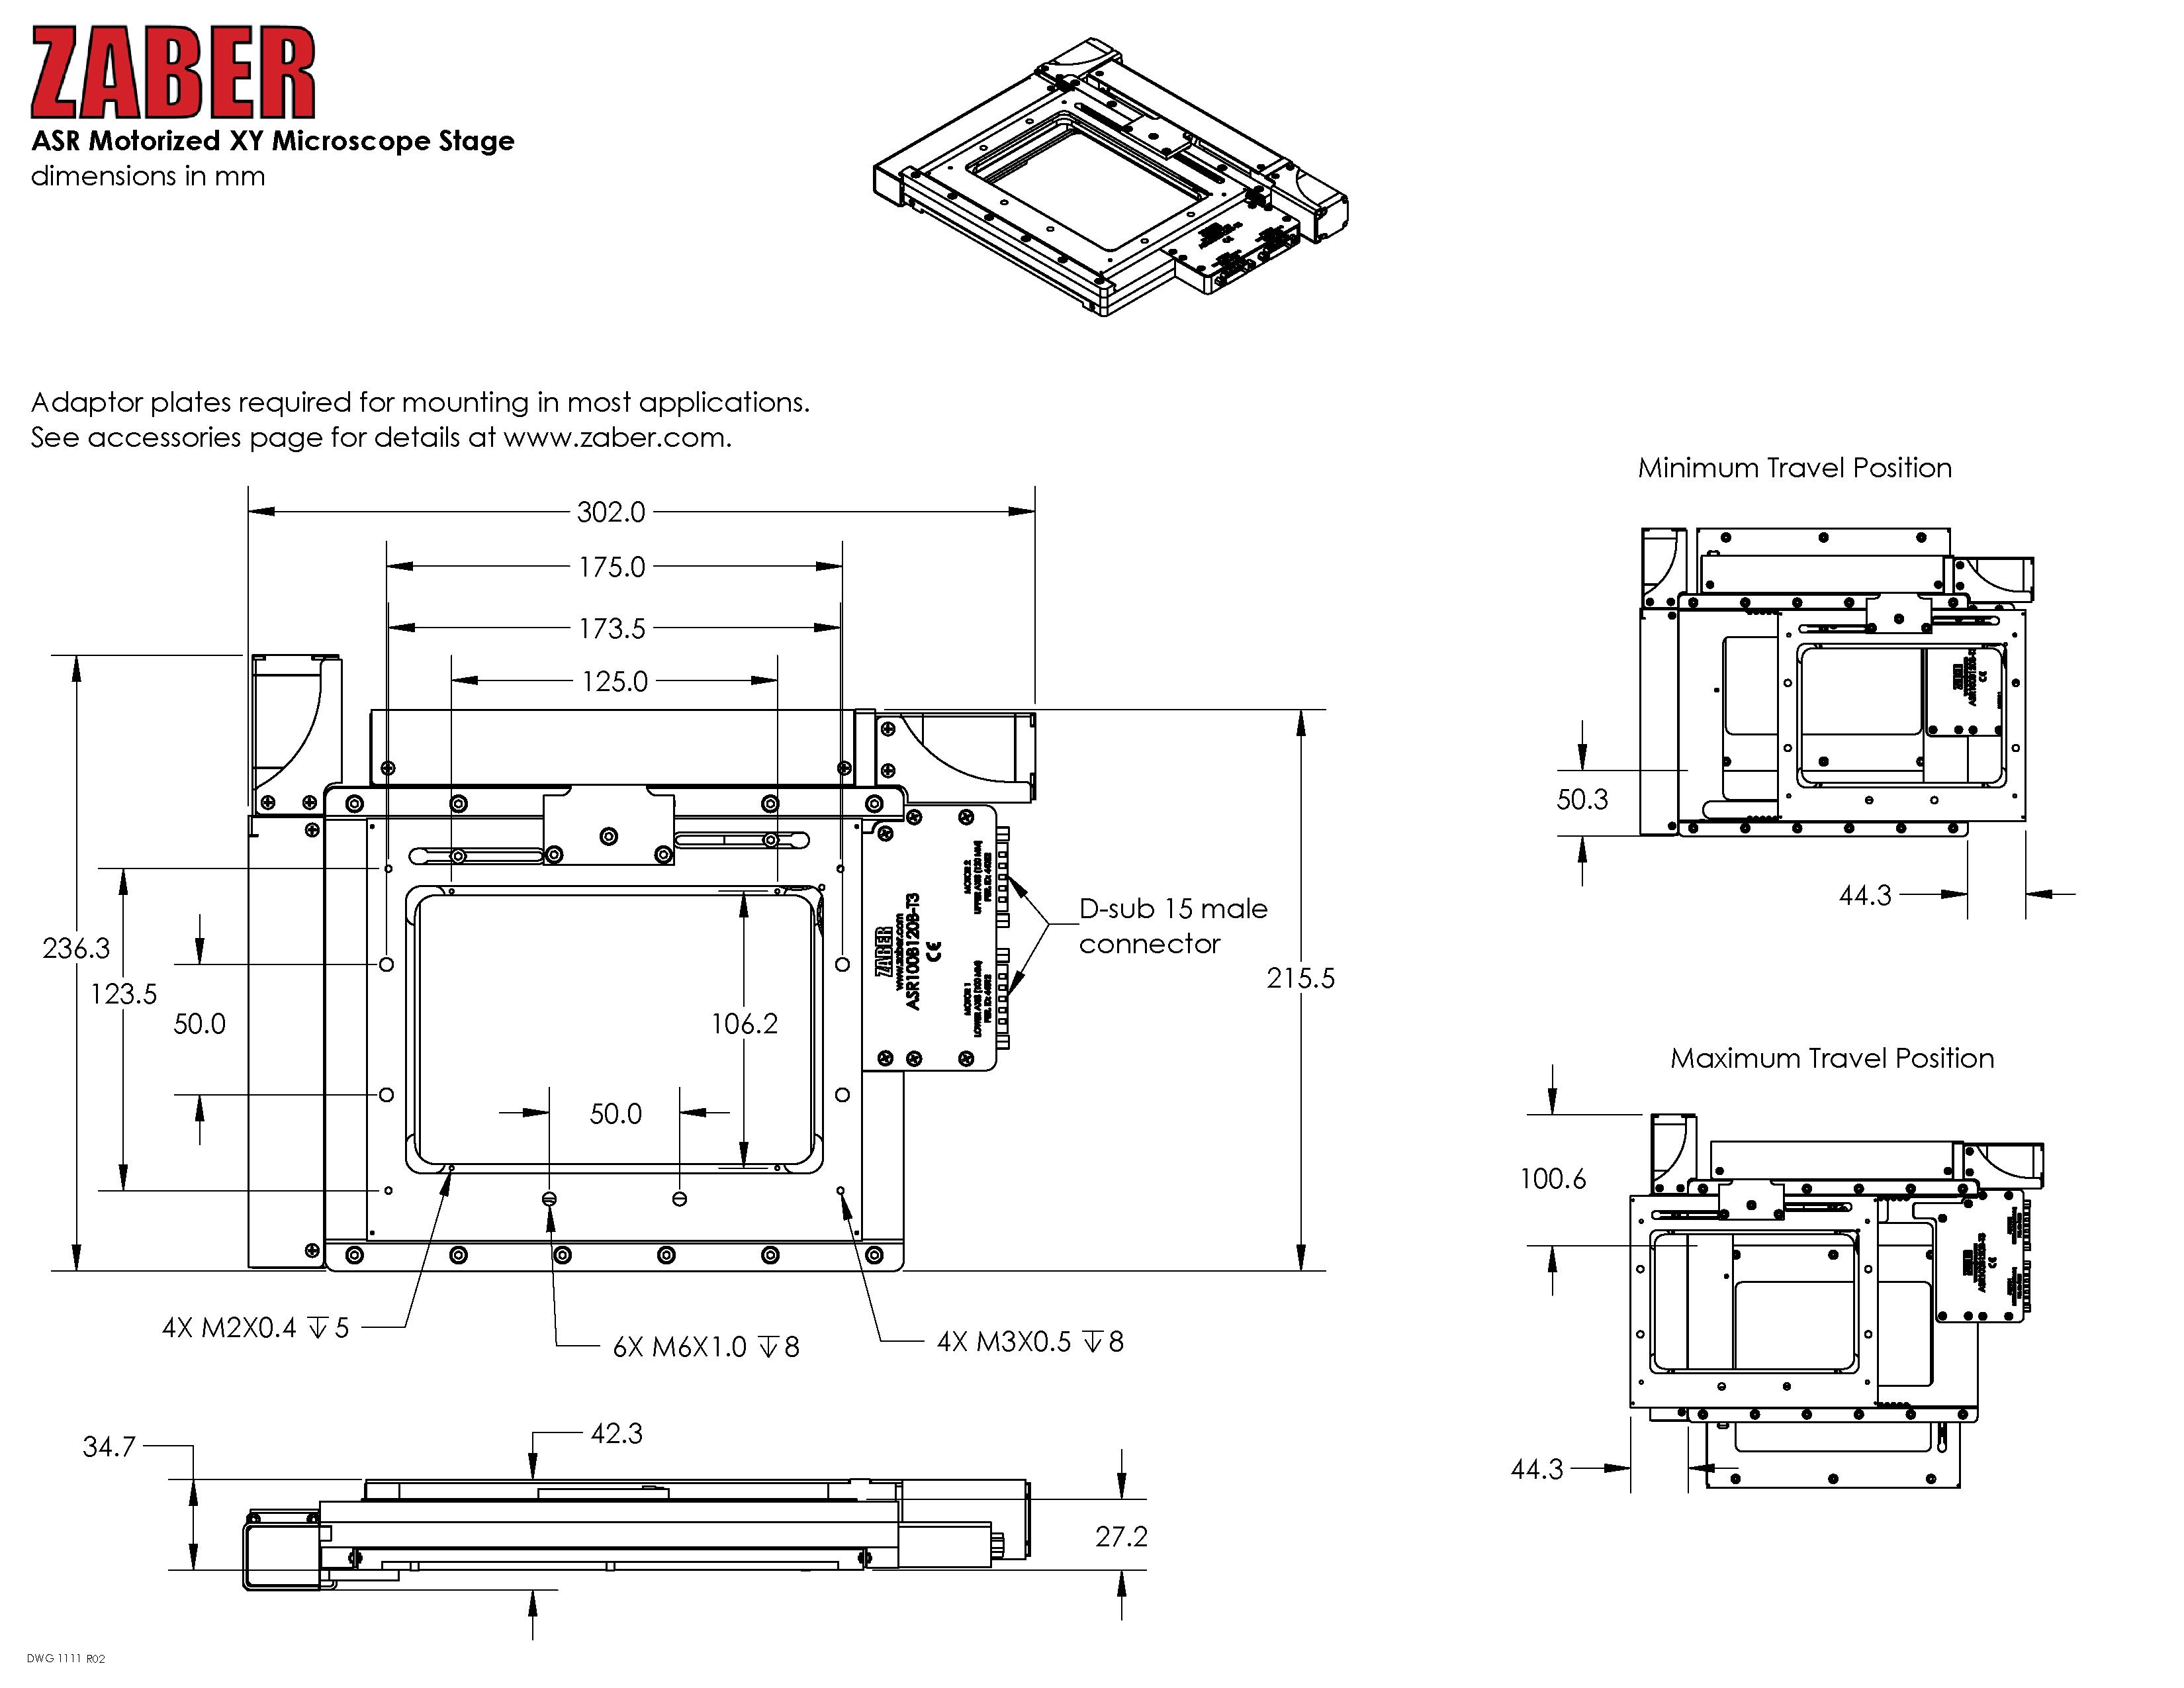 100 x 120mm Zaber™ Motorized XY Microscope Stage | Edmund Optics